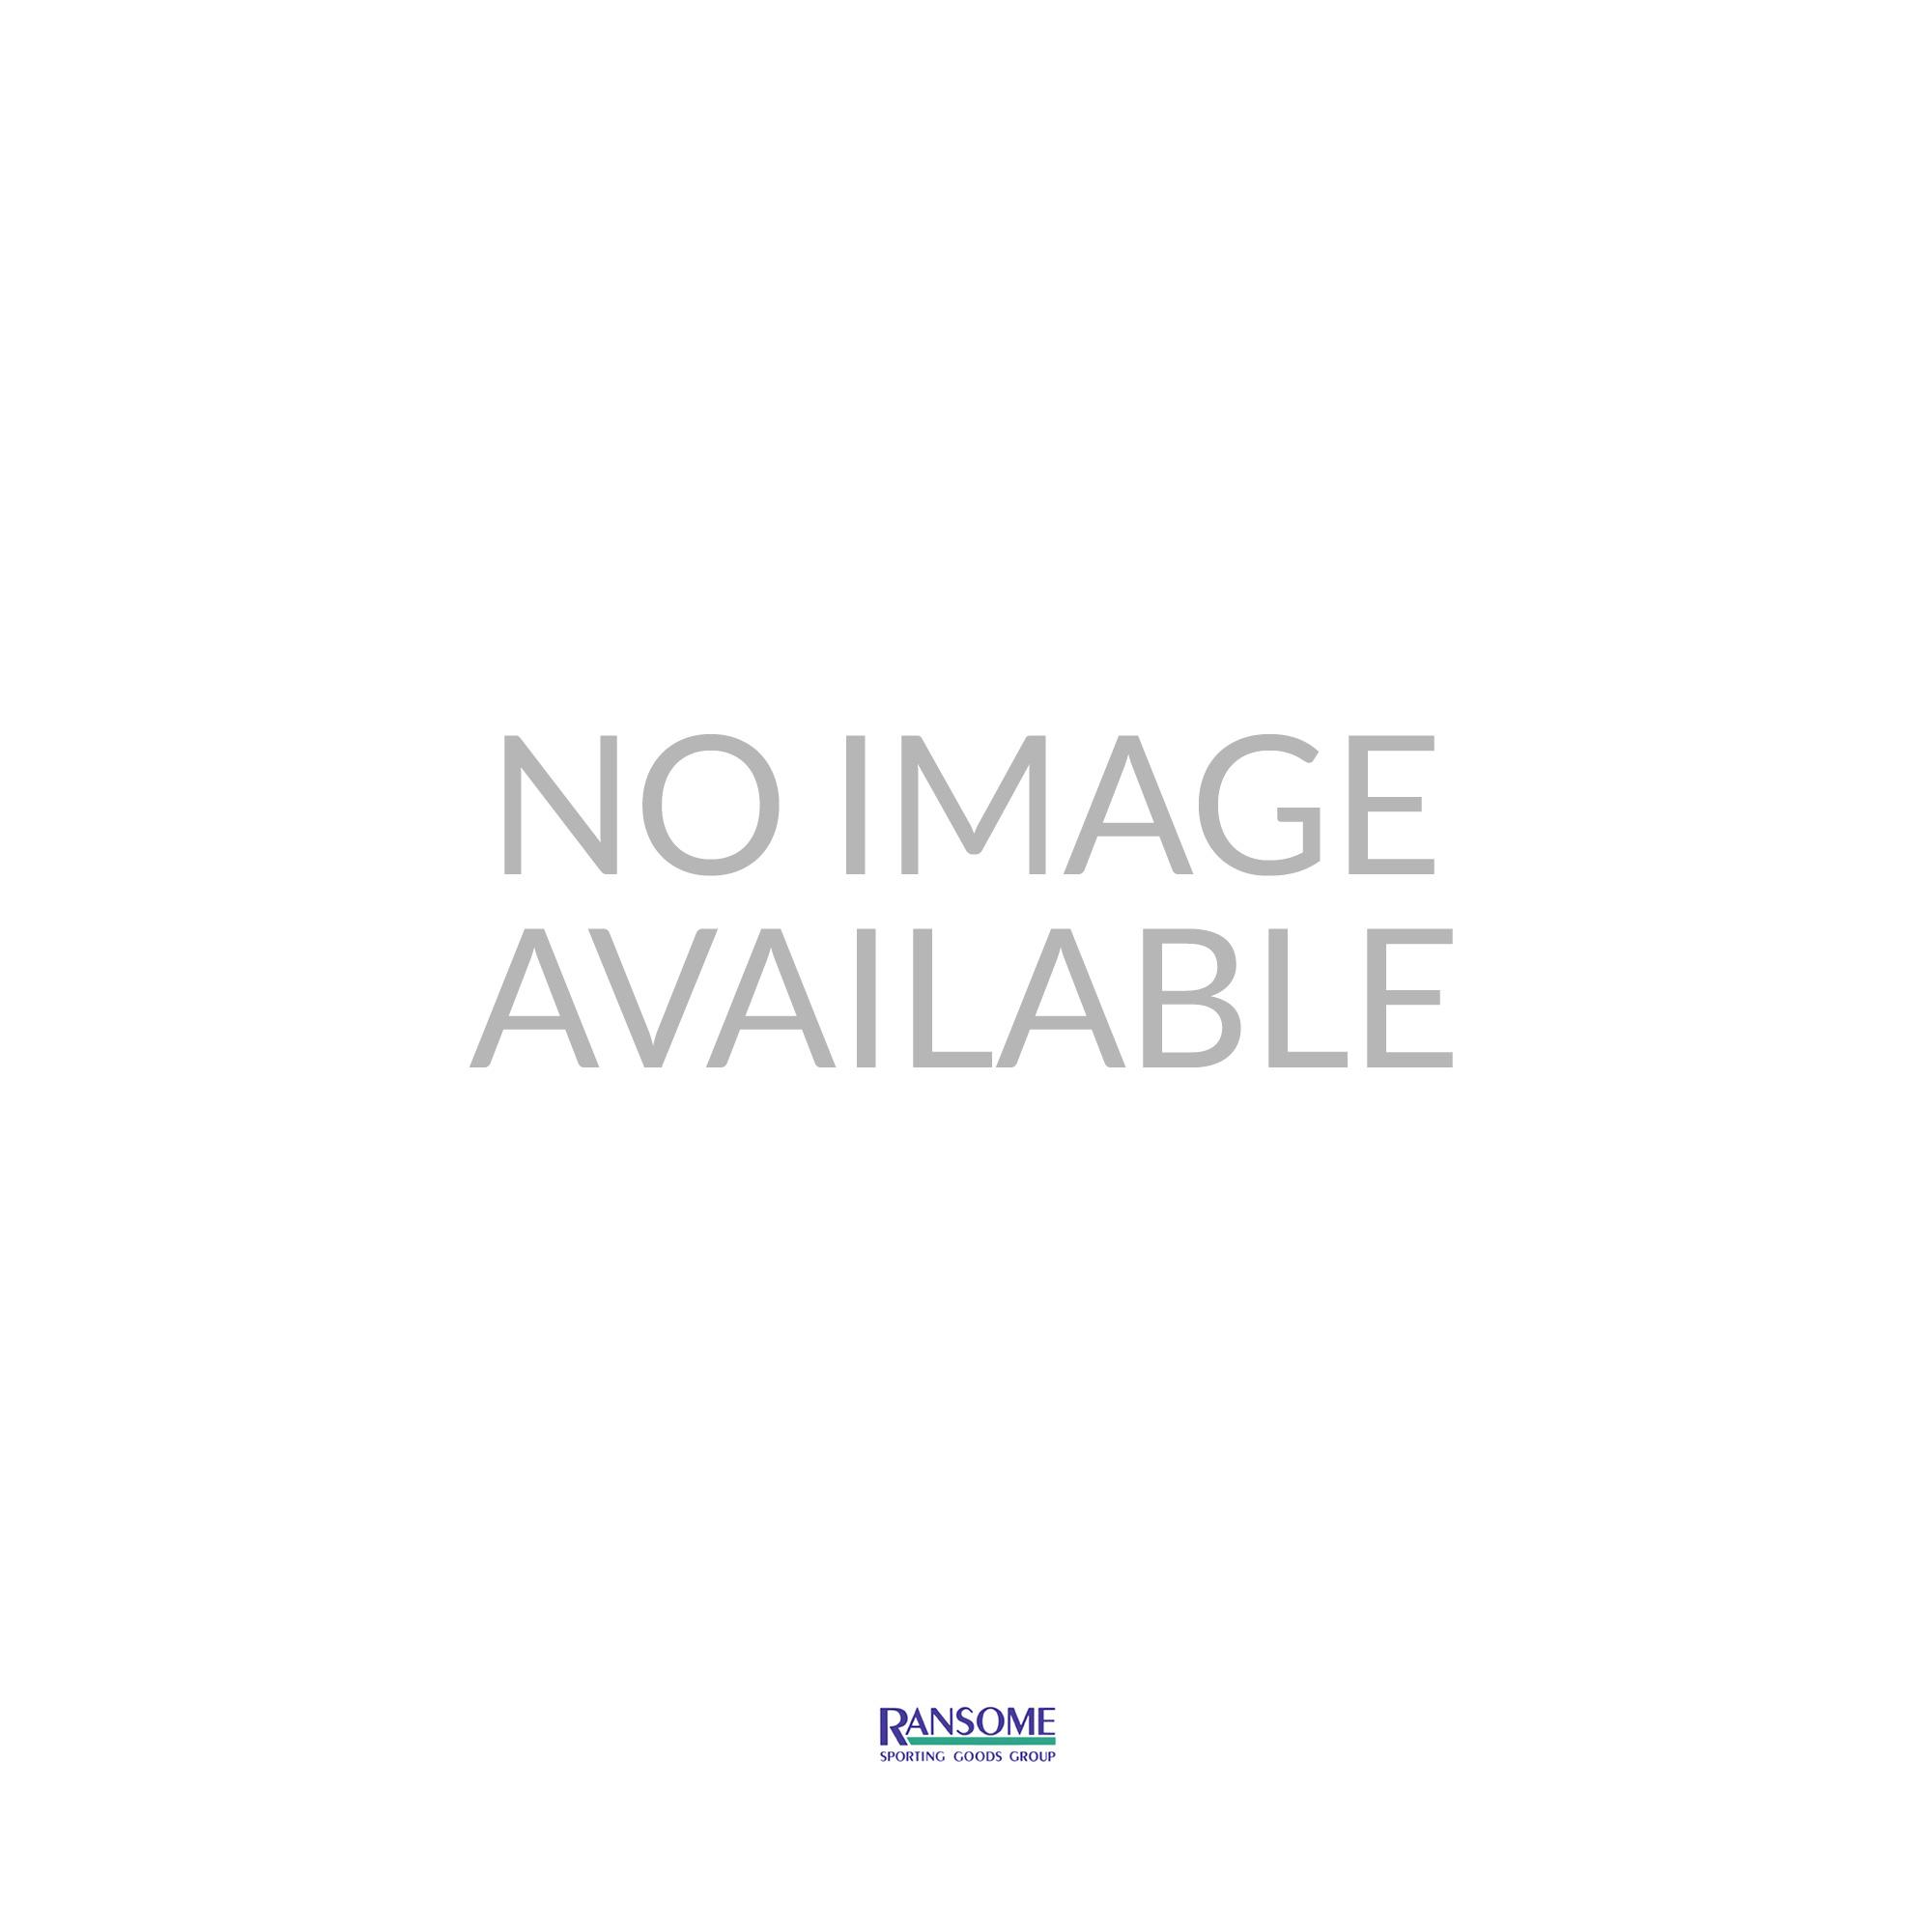 BISI Classic 25 Badminton Racket